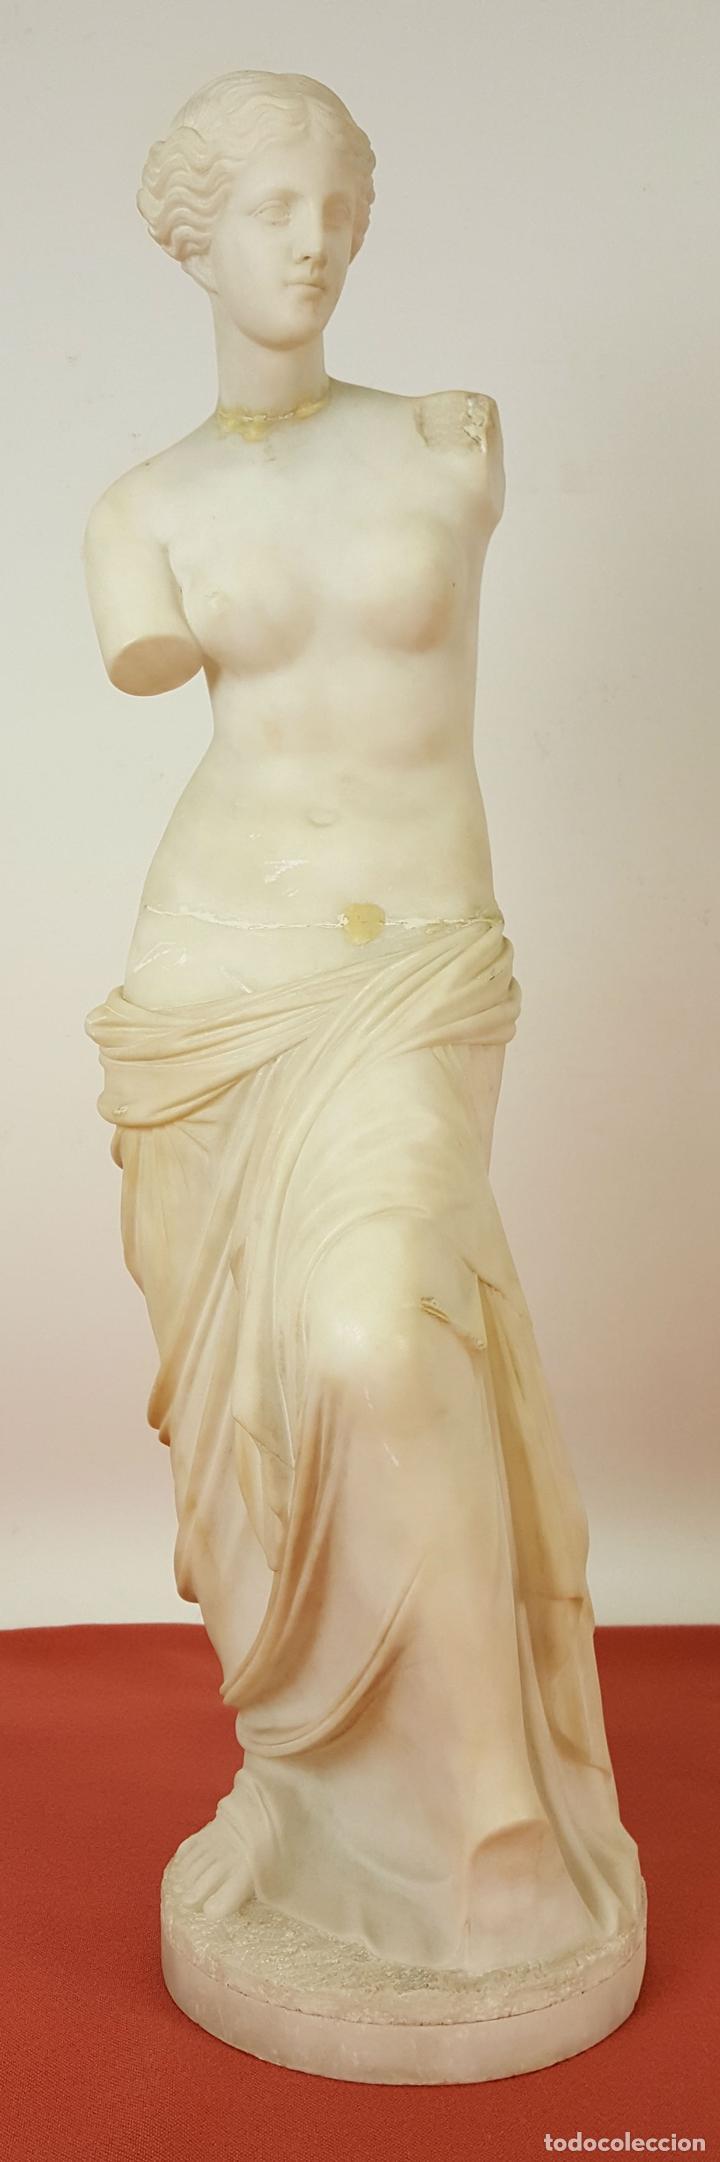 VENUS DE MILO. ESCULTURA EN MARMOL. SIGLO XIX-XX. (Arte - Escultura - Piedra)